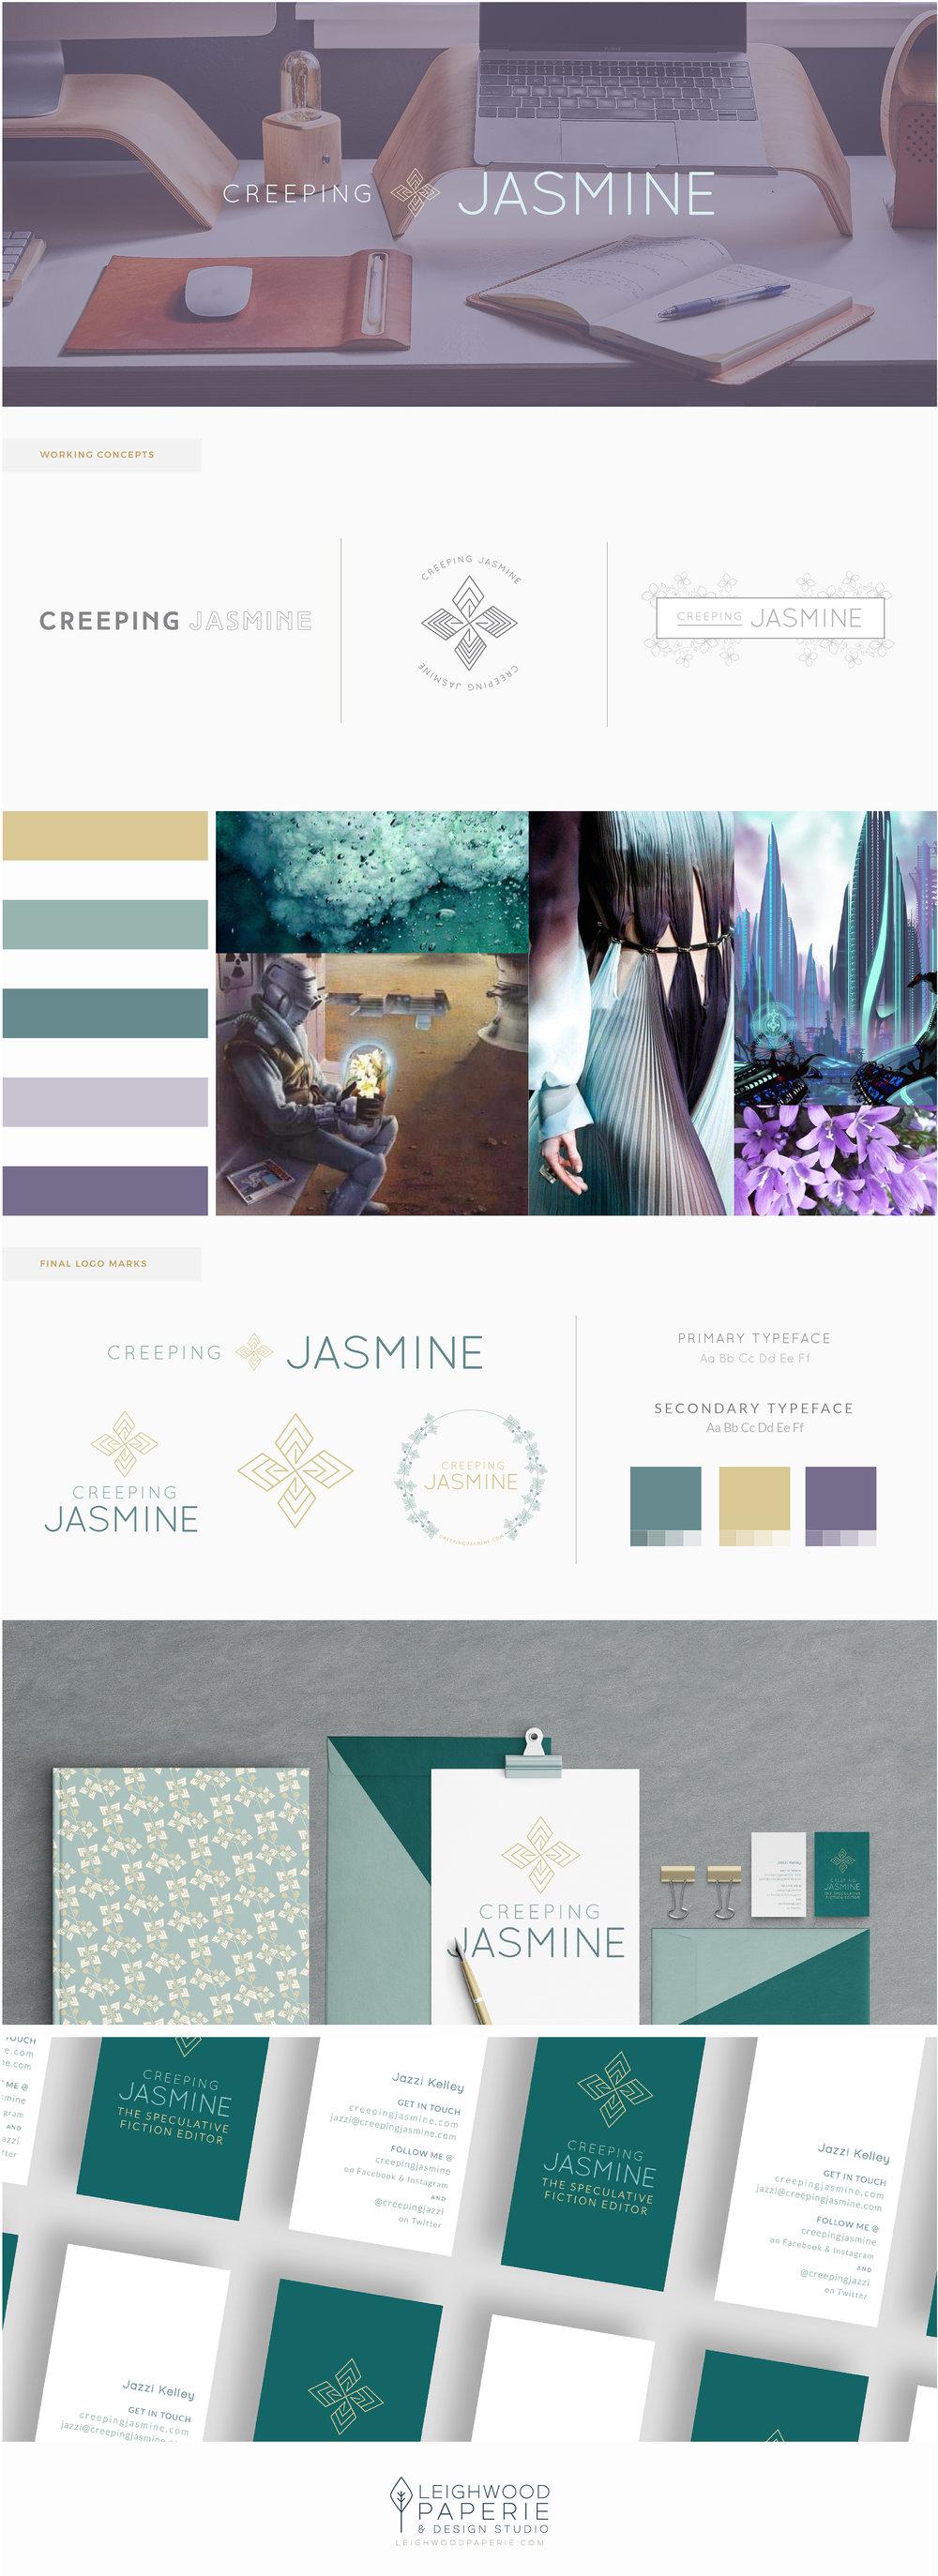 LeighwoodPaperie   Branding Portfolio   Creeping Jasmine